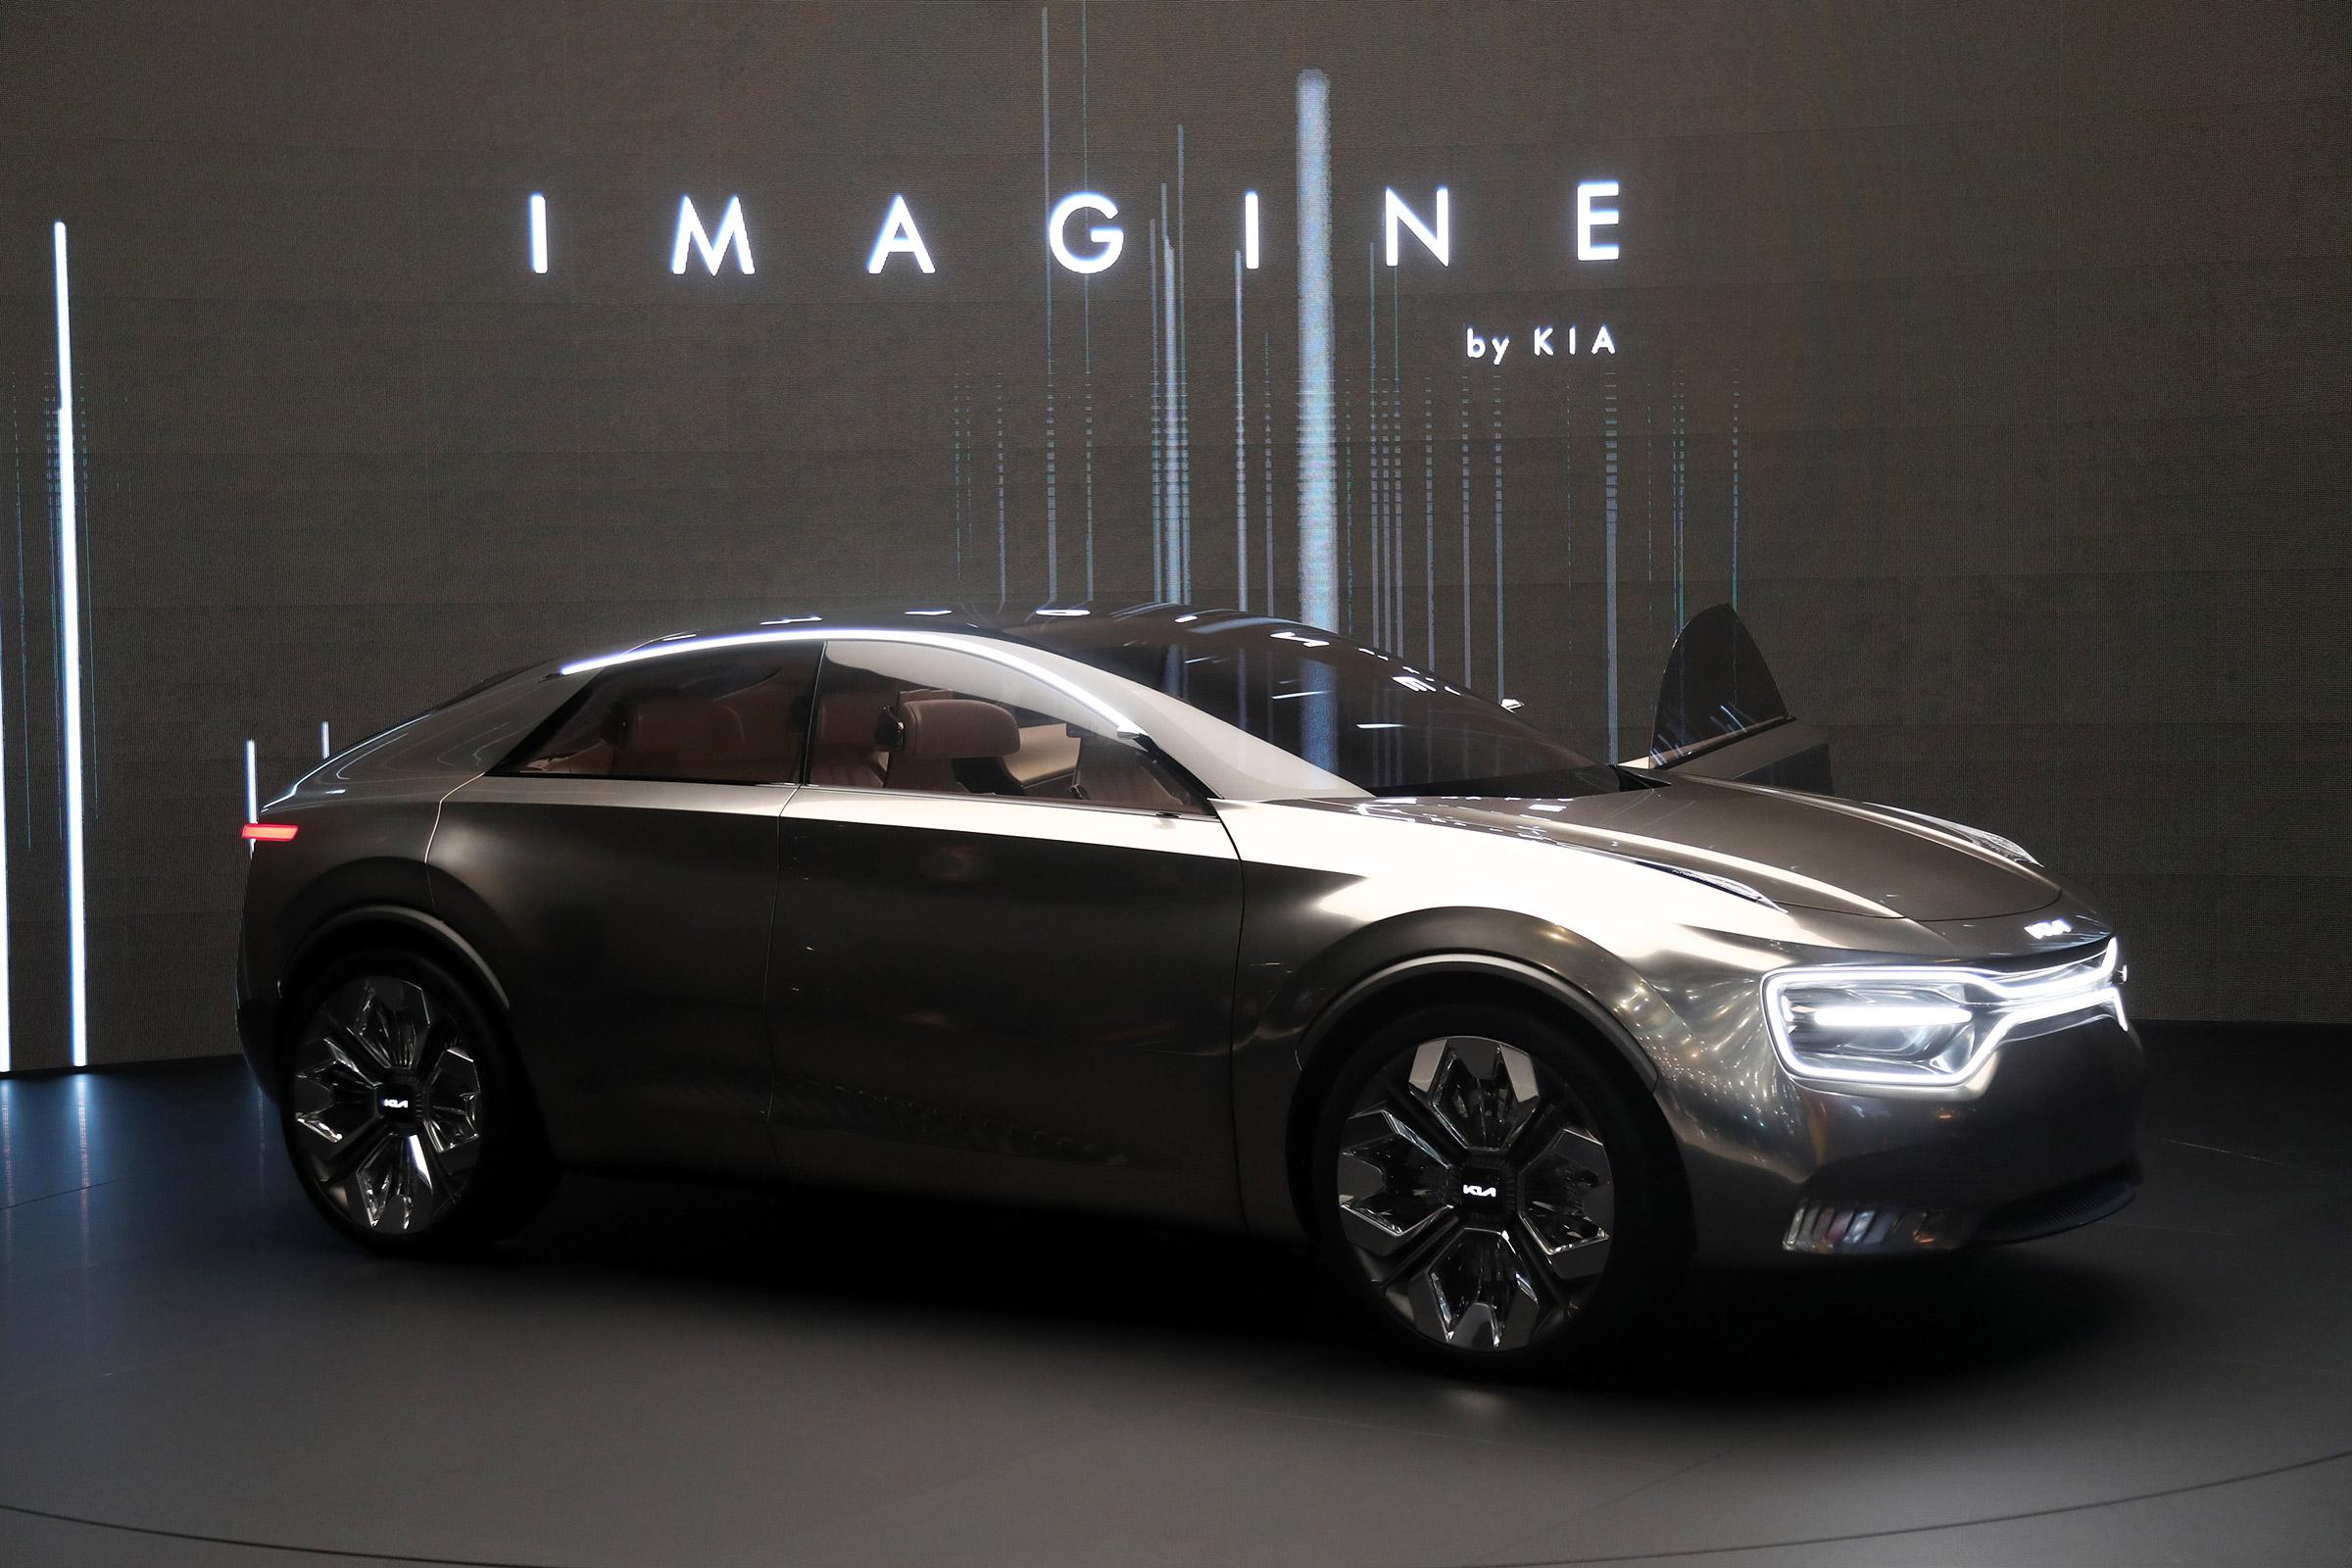 Imagine by Kia will launch as Tesla-fighting halo EV ...